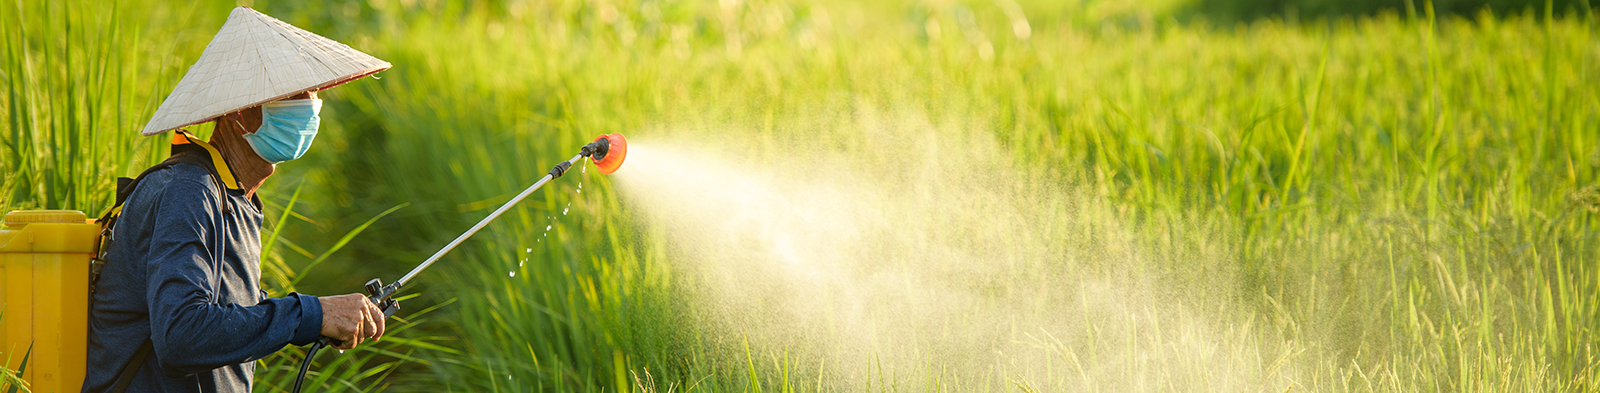 Chinese farmer sprays pesticide on crops